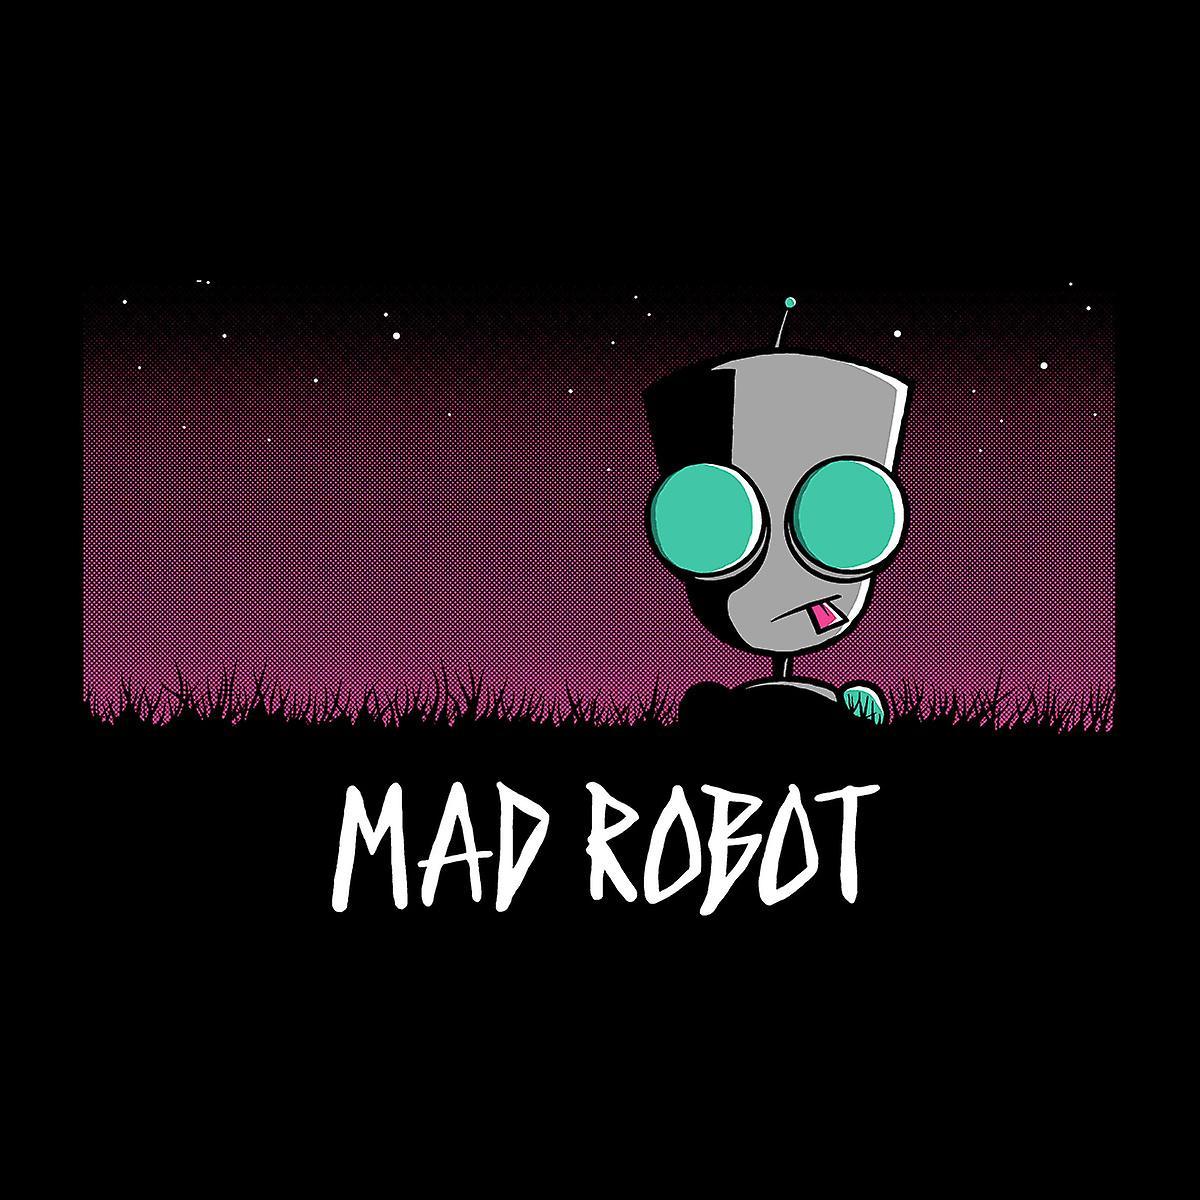 Mad Robot Gir Invader Zim Women's Sweatshirt